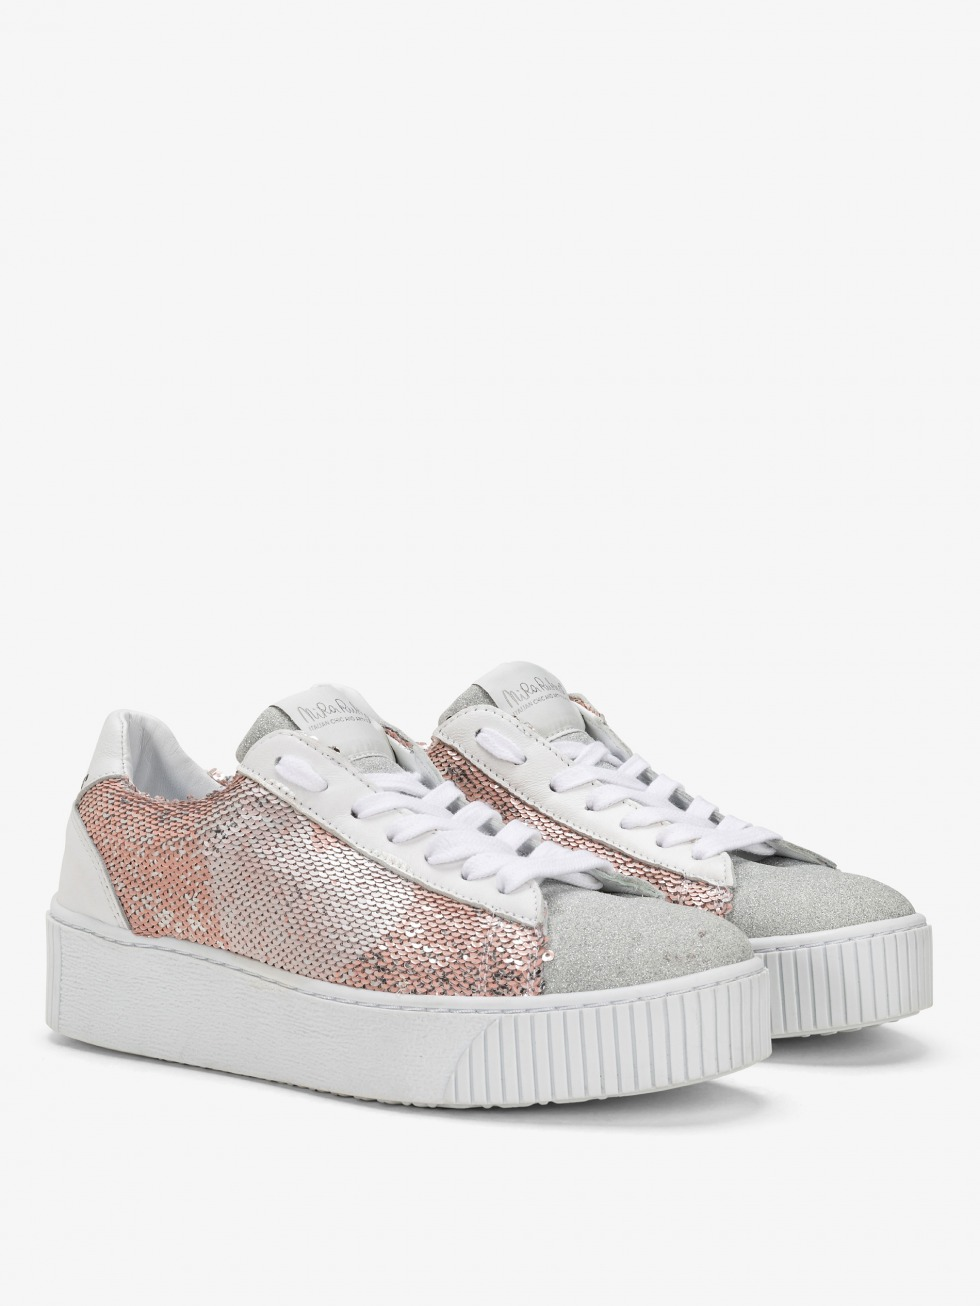 Cosmopolitan Sneakers - Sparkle Pink Heart